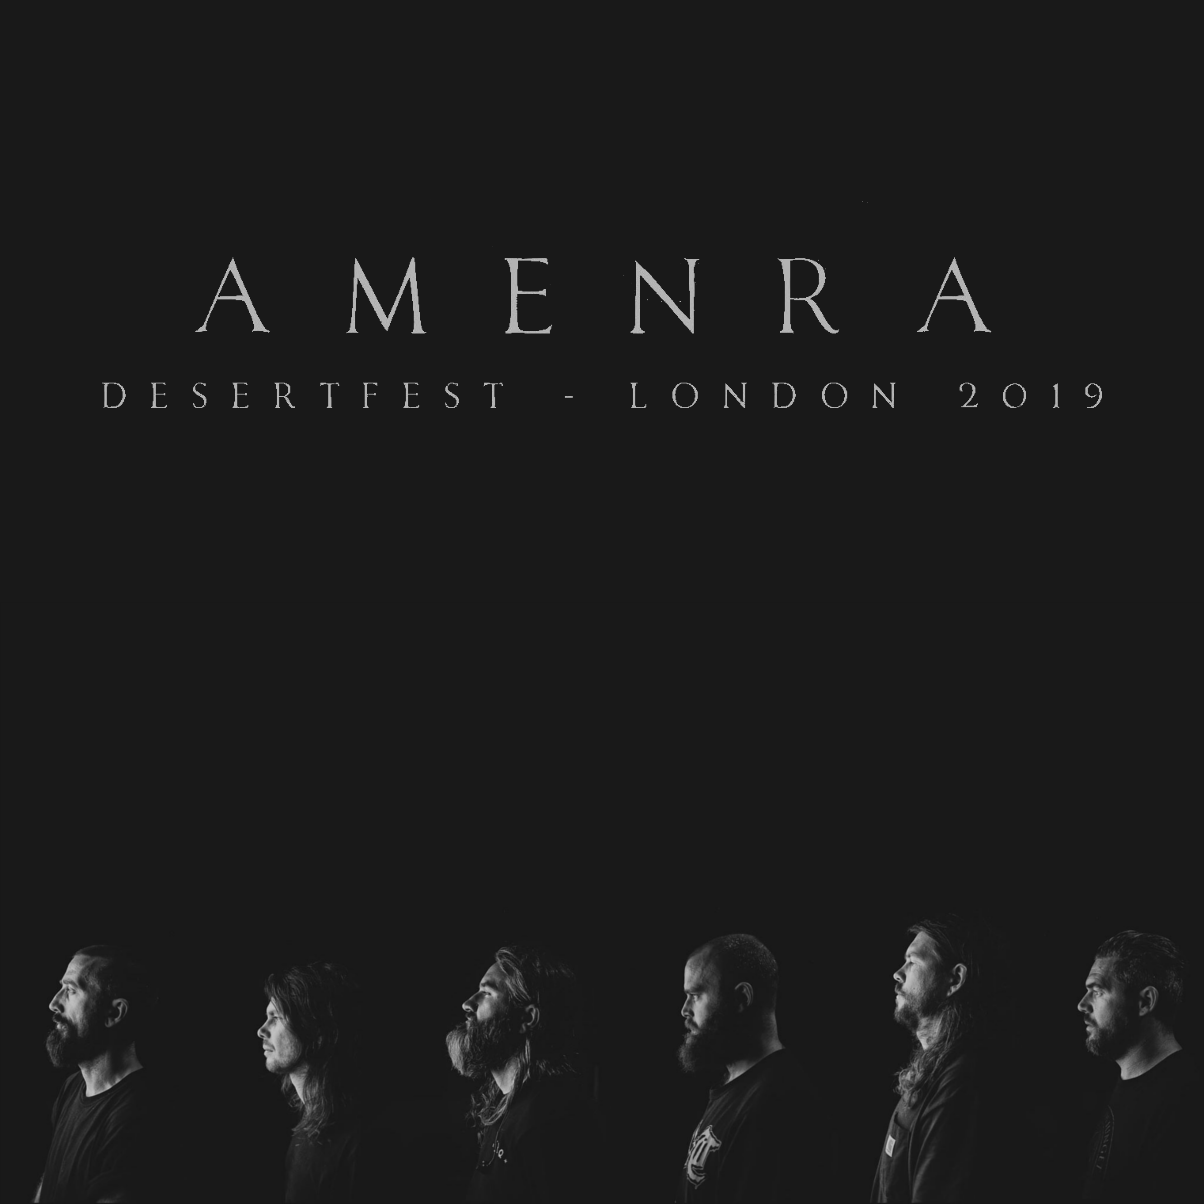 AMENRA TO CELEBRATE 20 YEARS BY HEADLINING DESERTFEST!